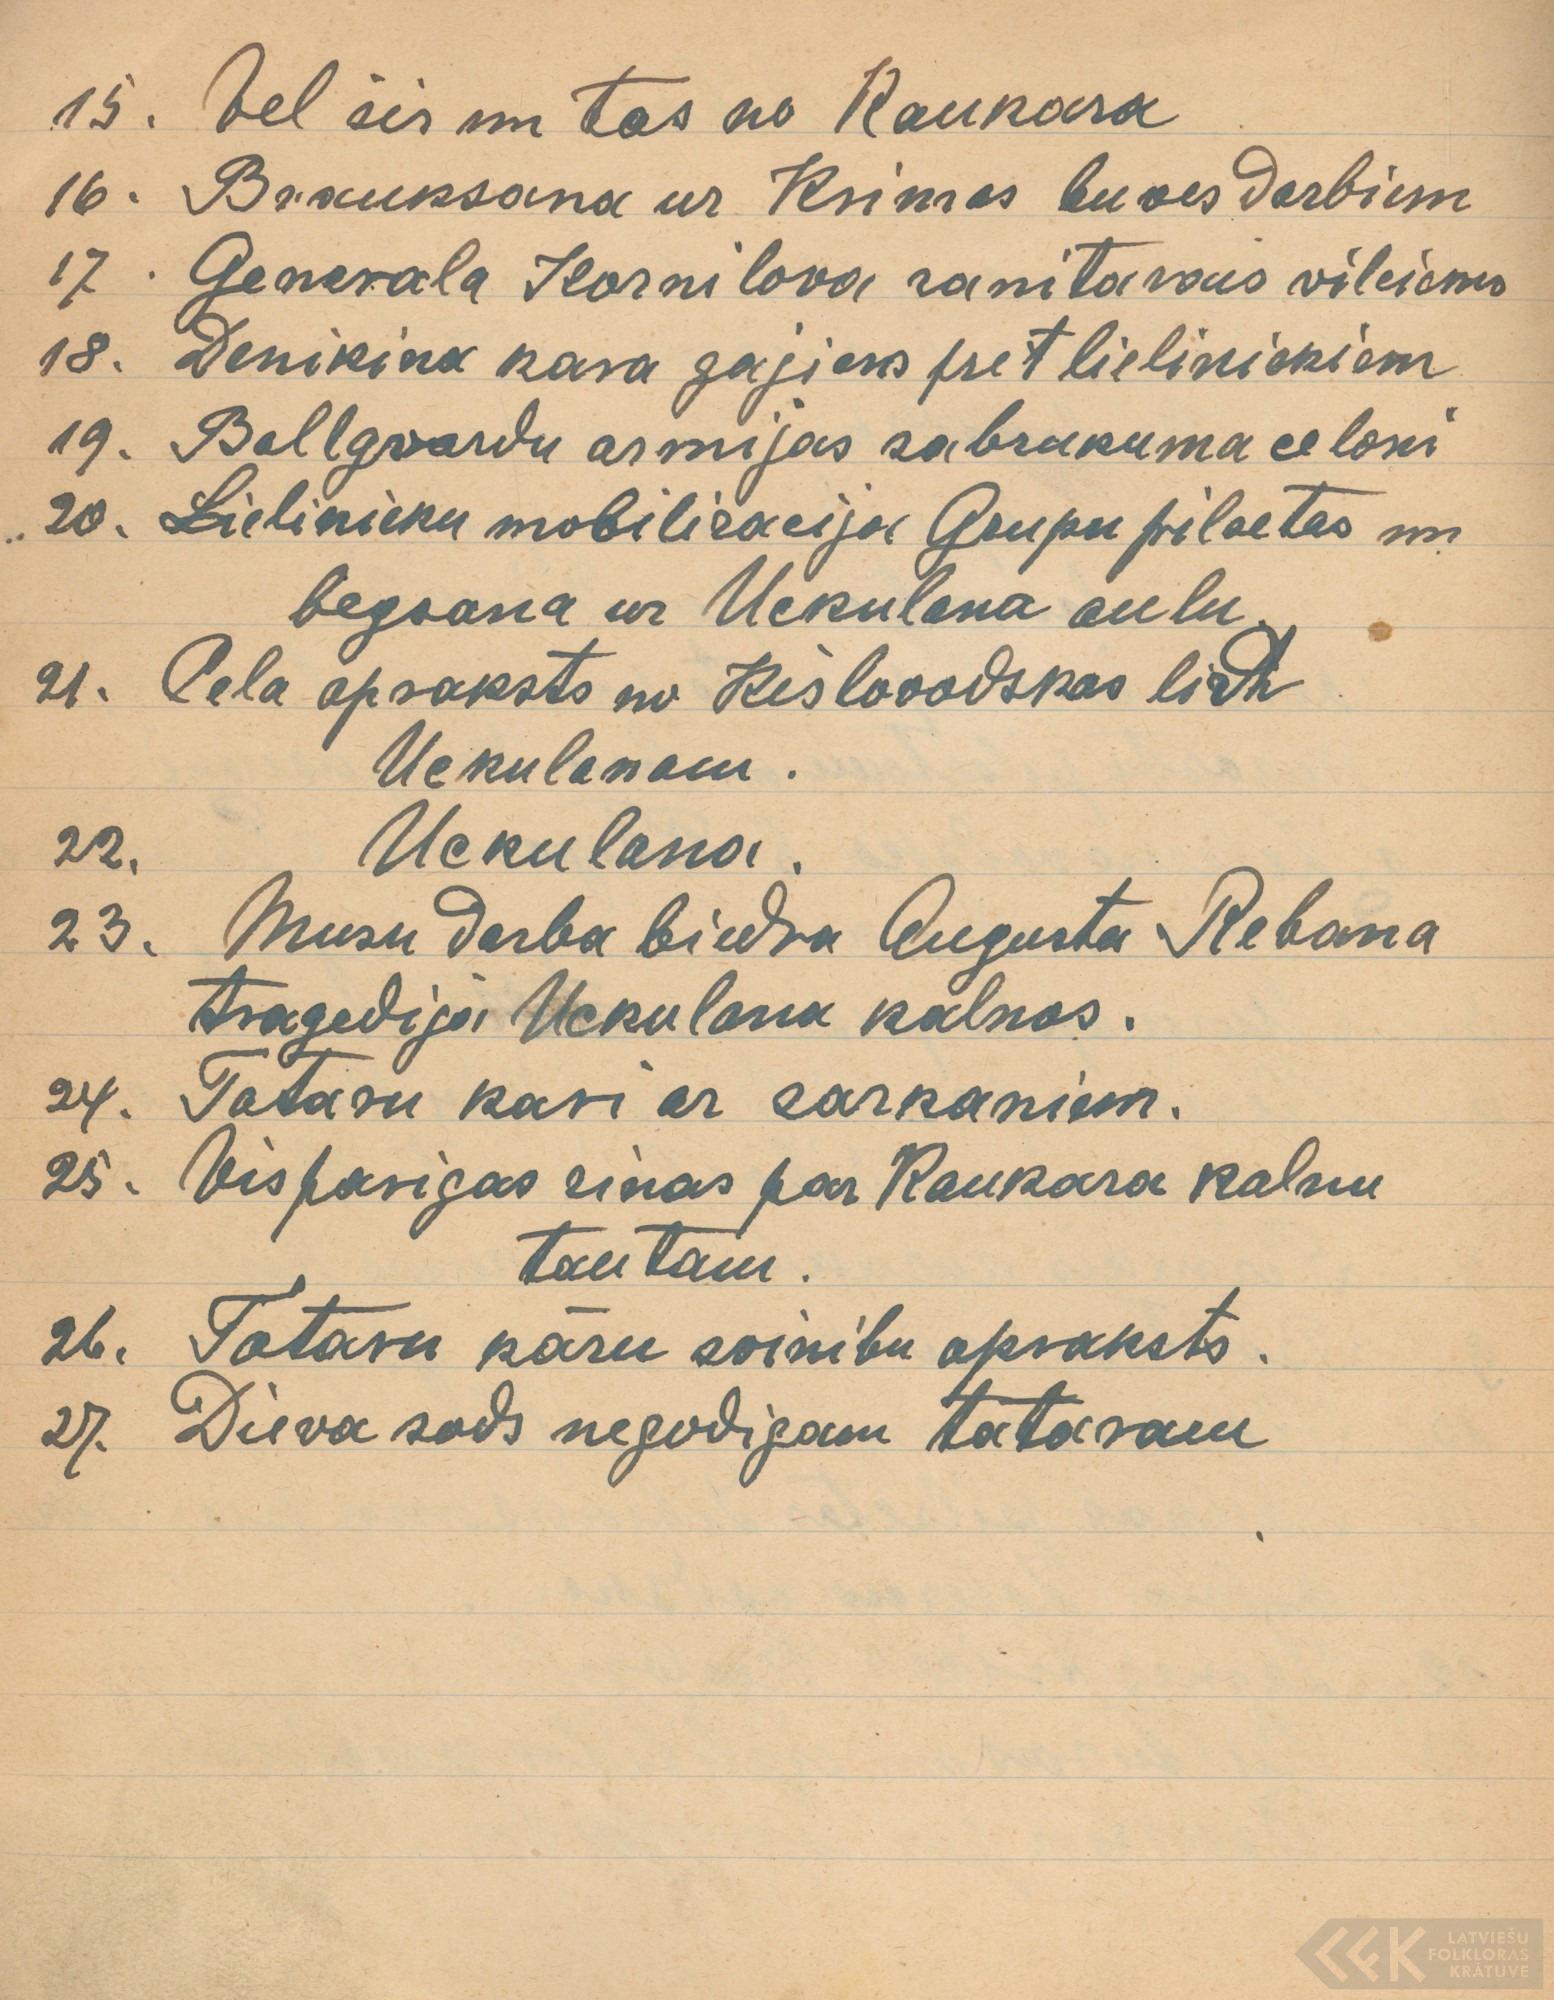 Ak151-Eduarda-Smurga-atminas-02-0004